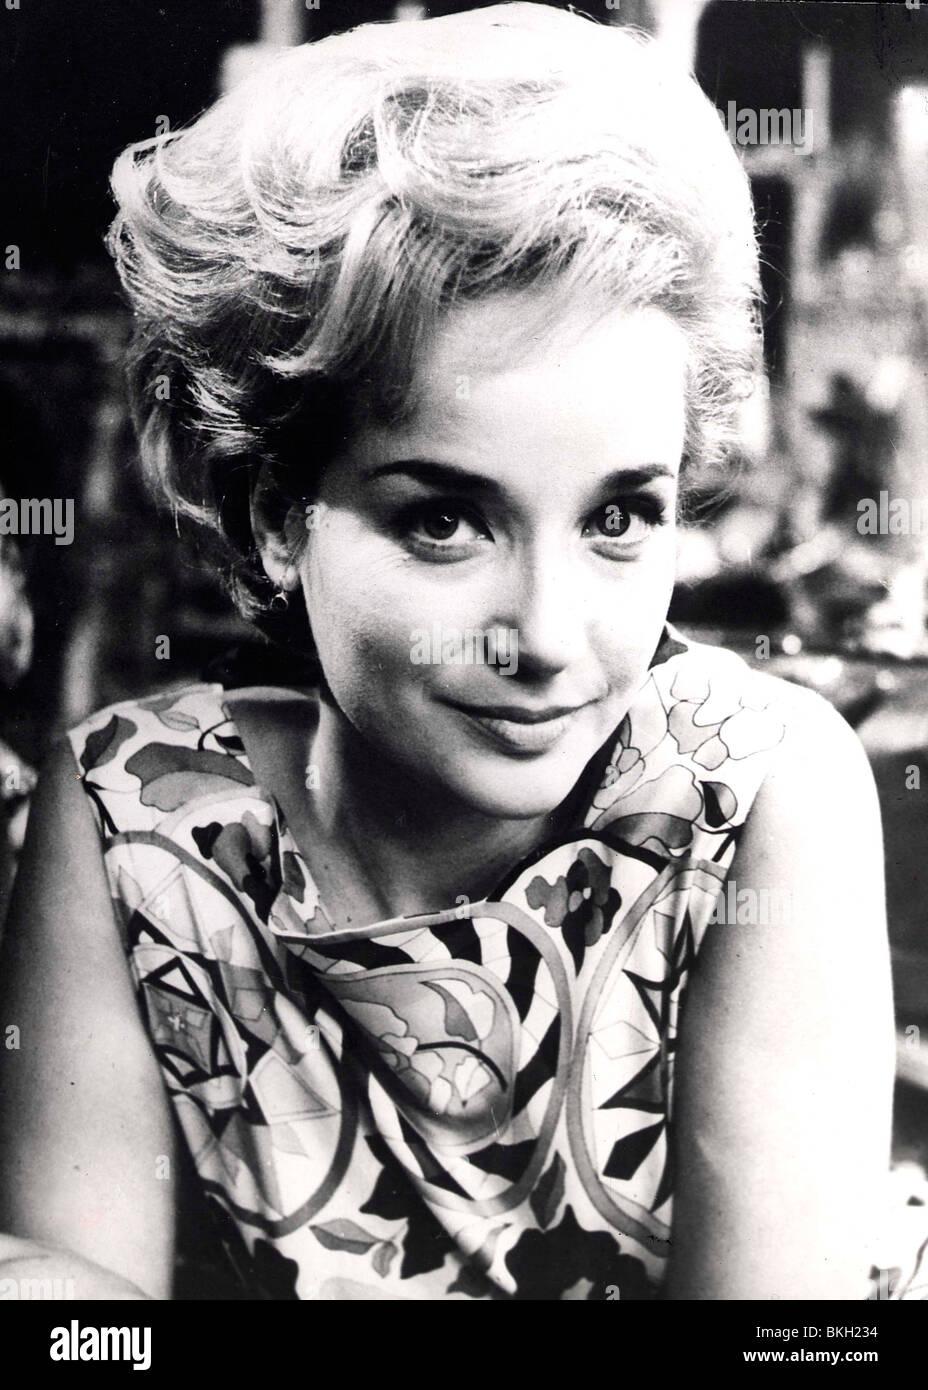 Sylvia Syms (born 1934) Sylvia Syms (born 1934) new picture